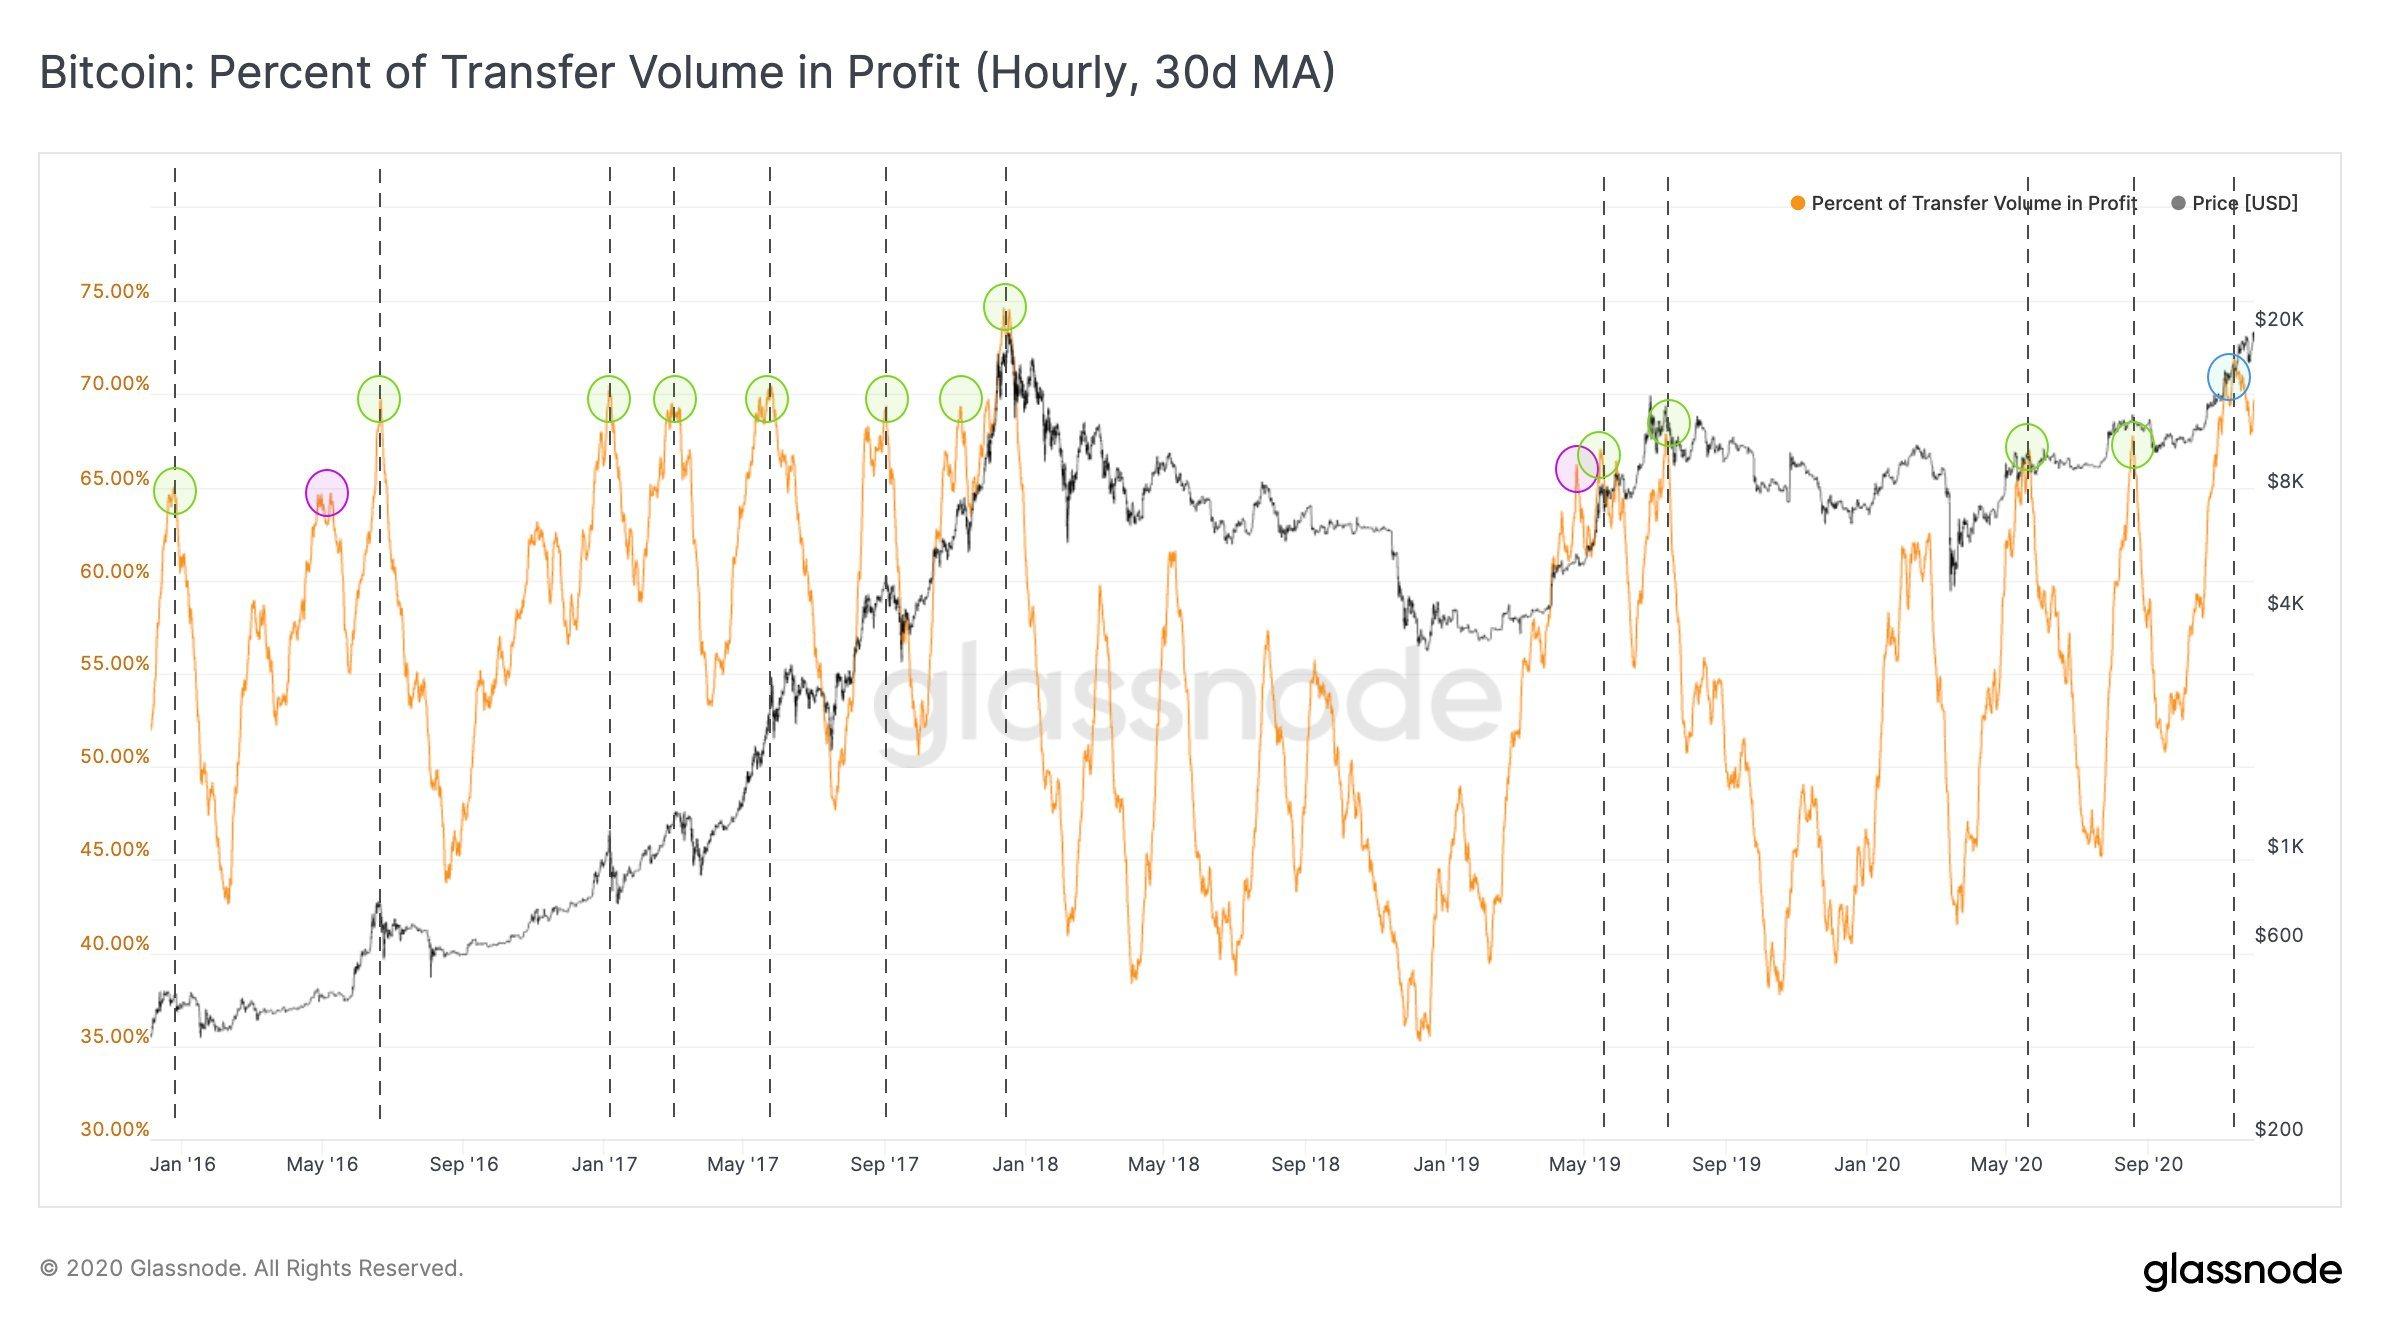 Bitcoin percentage of transfer volume in profit chart